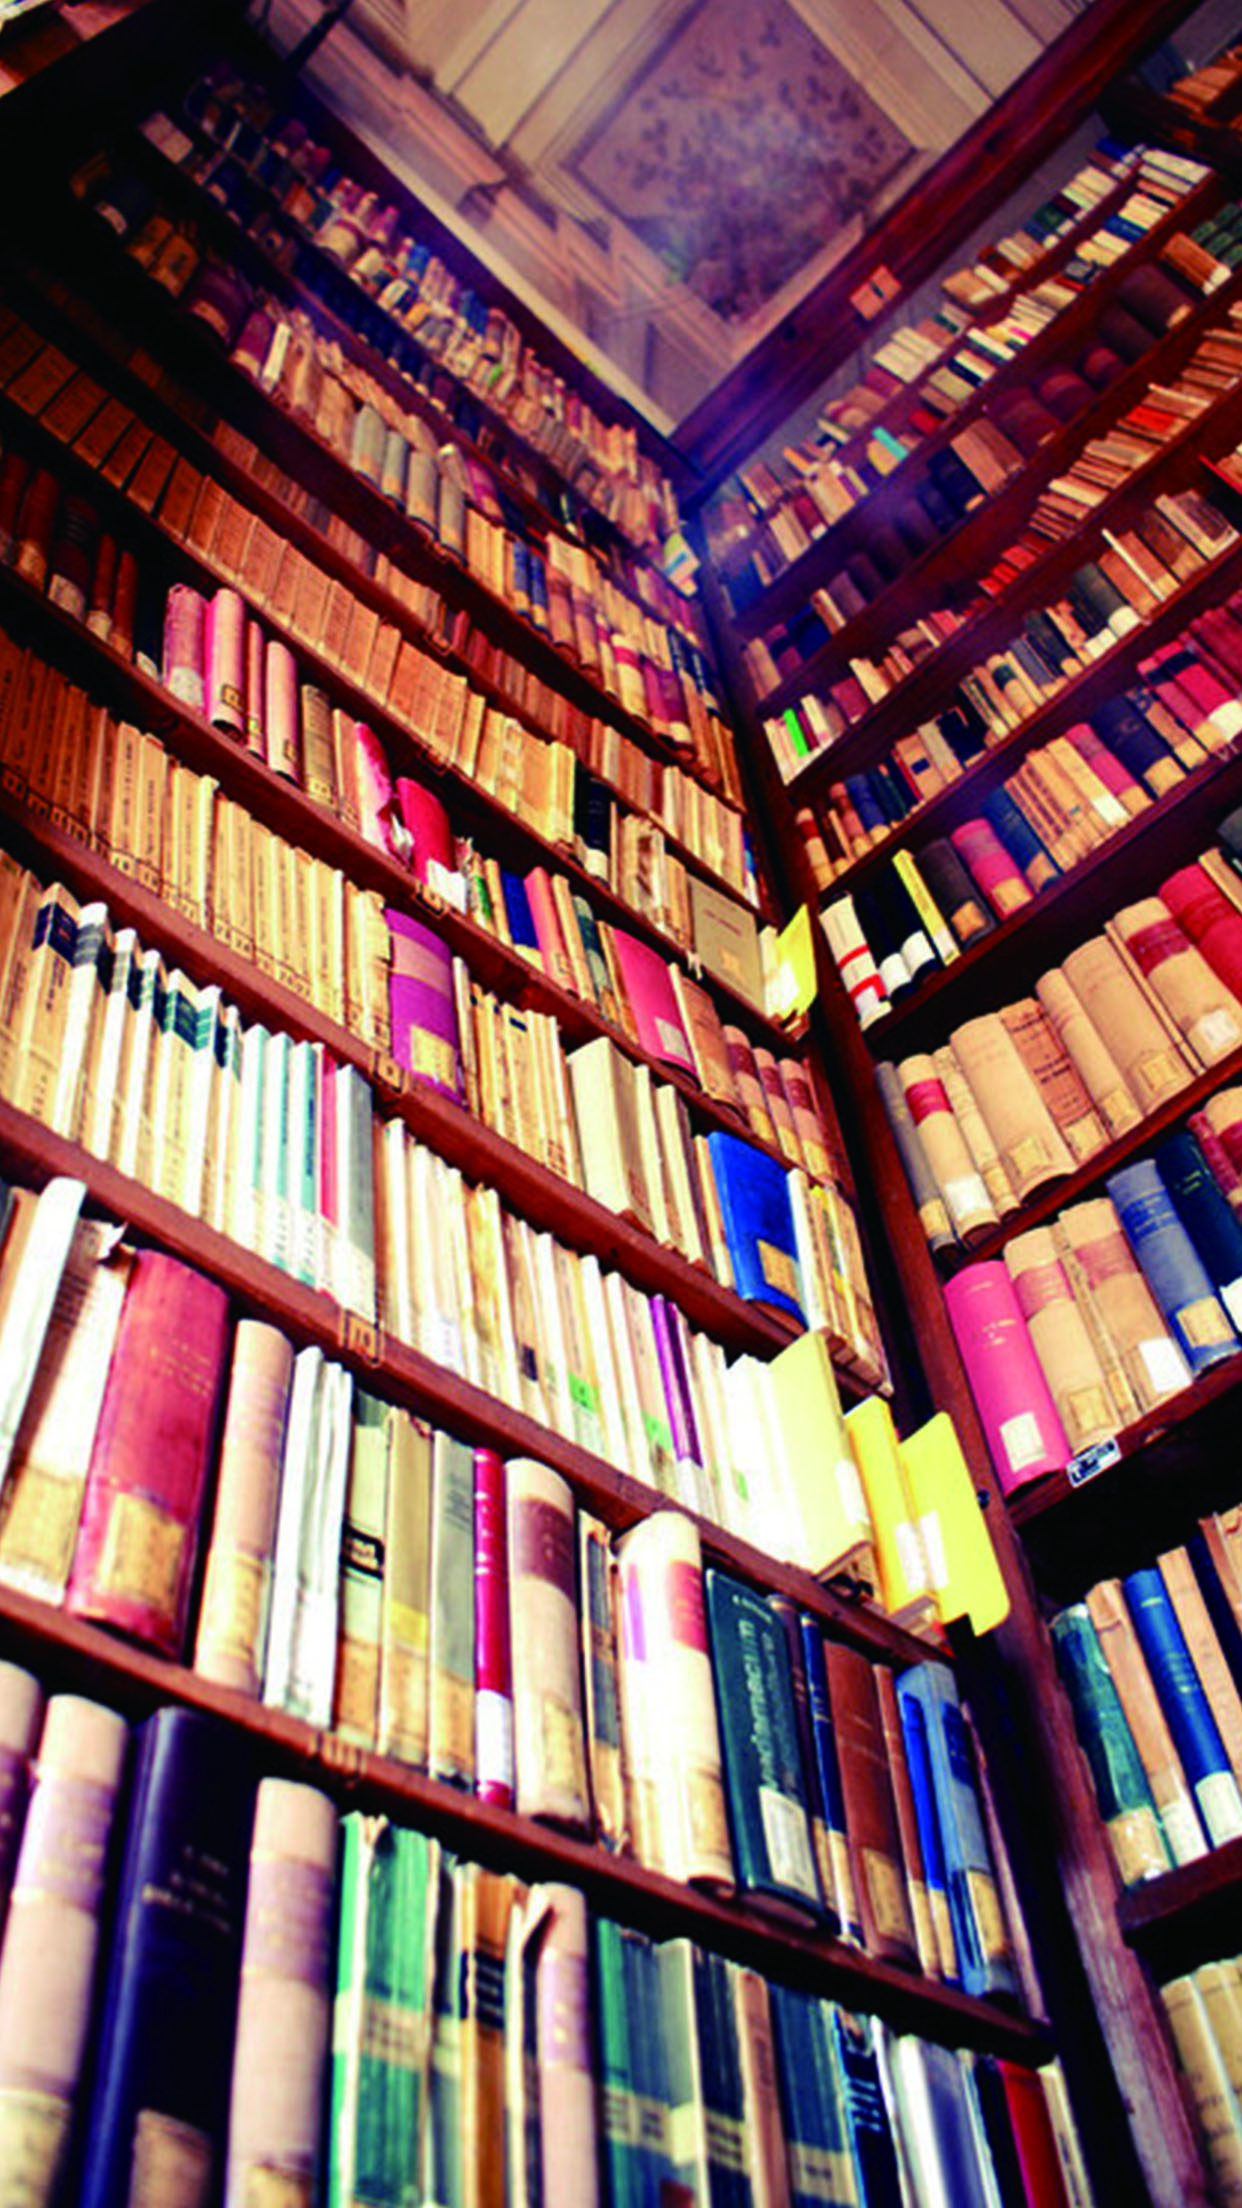 ebf4d4a6212e4 Libro de la biblioteca librería tienda de fondo Establecimiento Mercantil Edificio  Estanteria Imagen de fondo para descarga gratuita